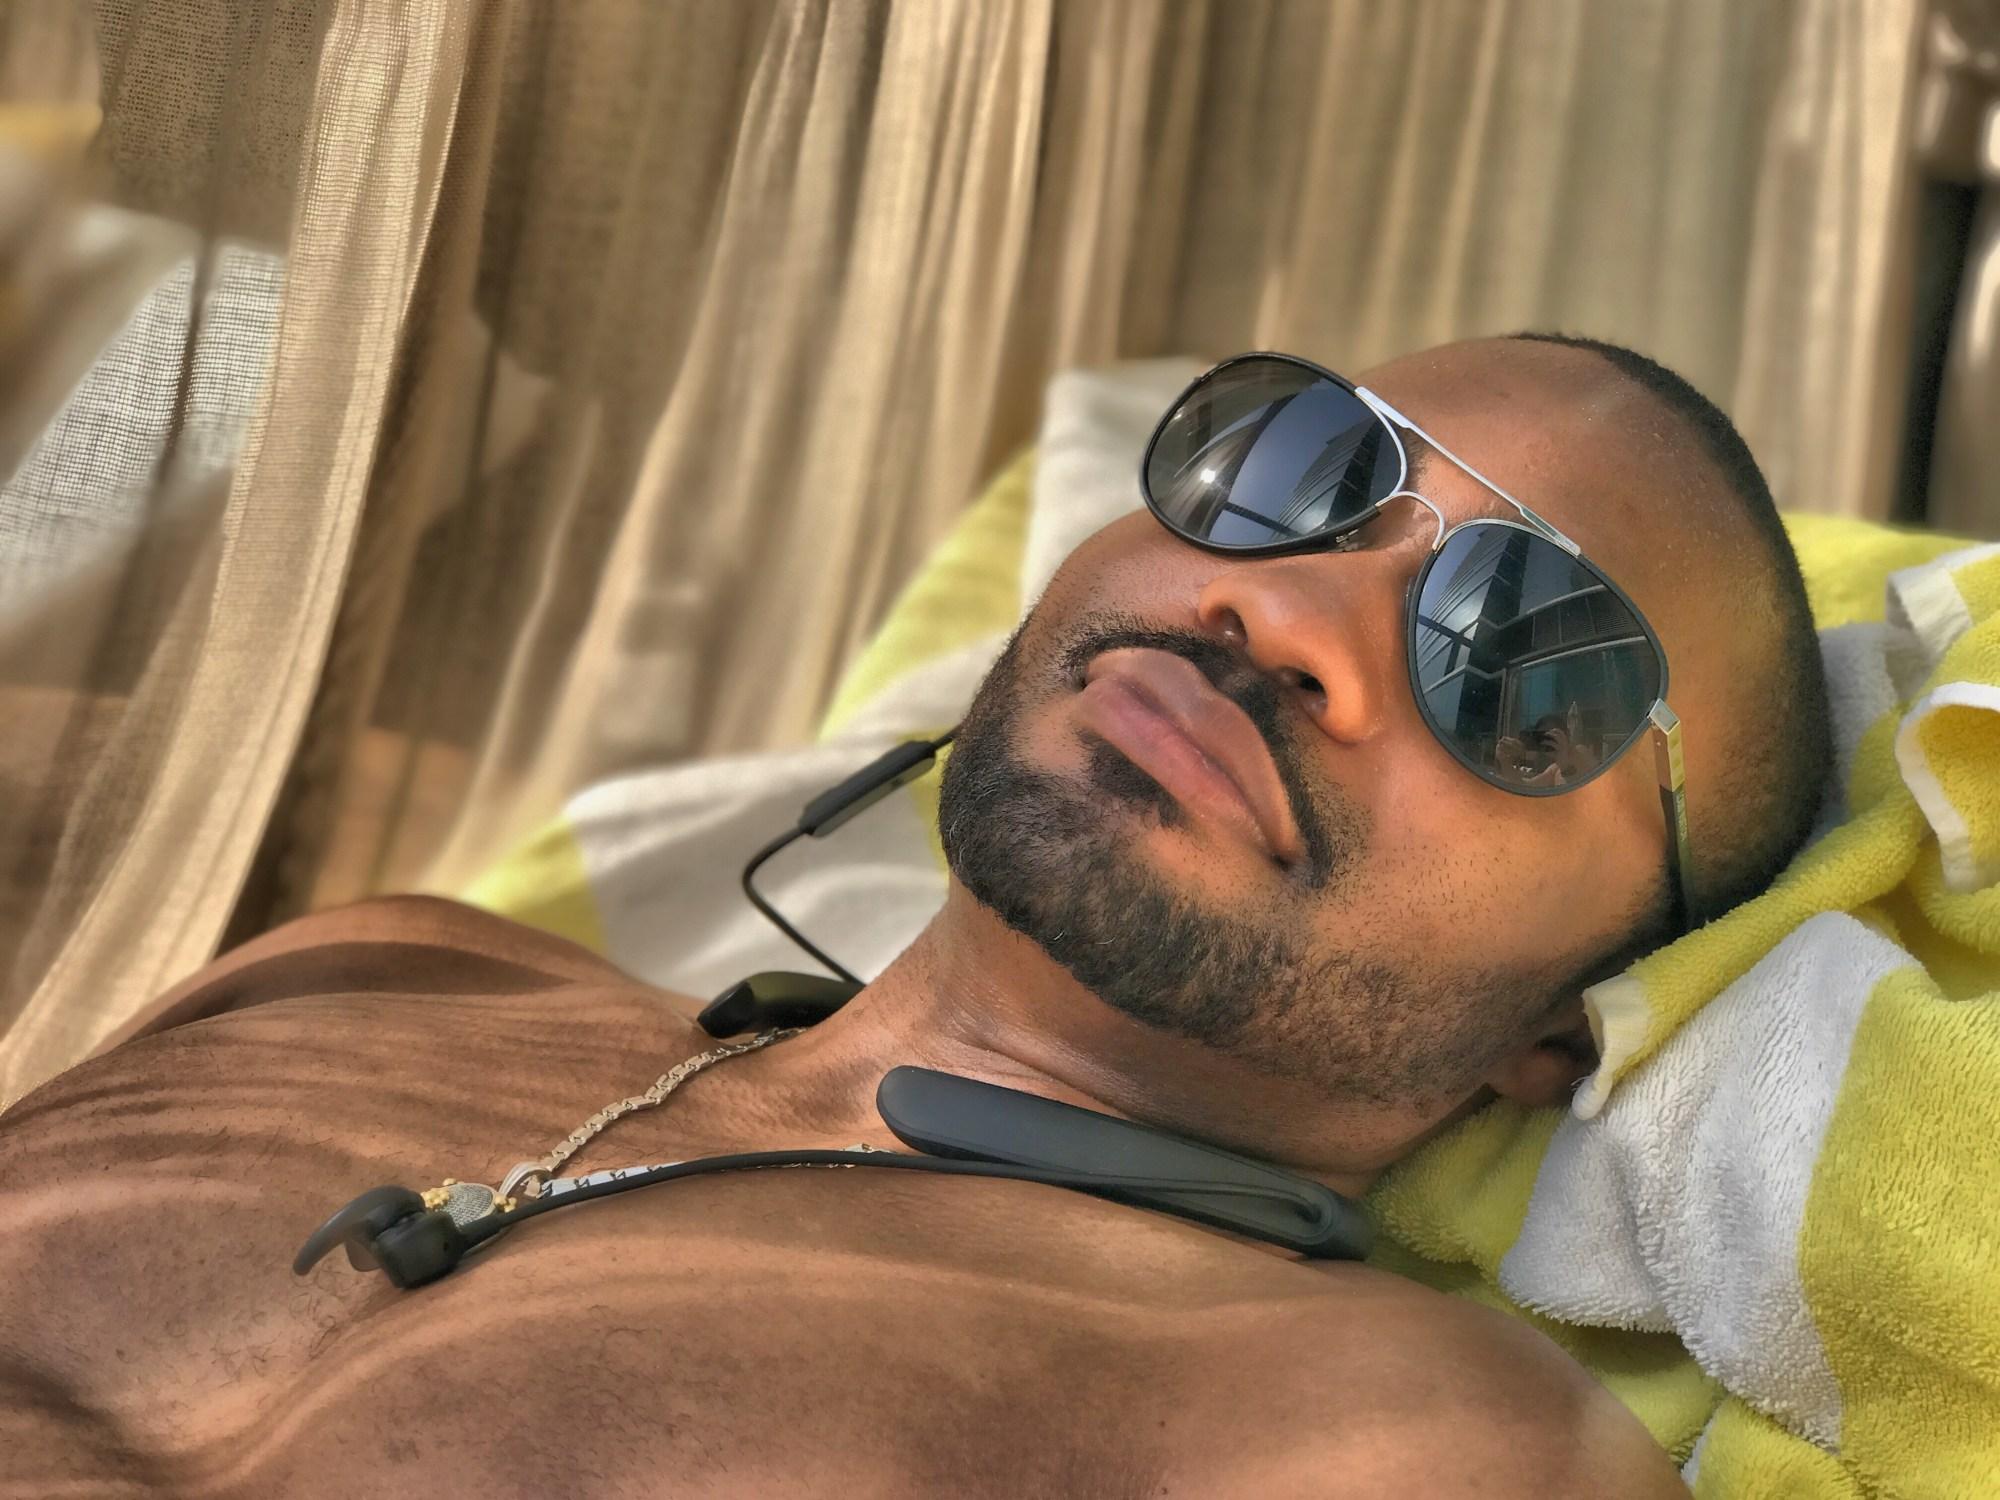 Dubai Tyrone Smith UAE Taj Billionaire Mansion love positive nyc music social media influencer smile LV Bose celebrities